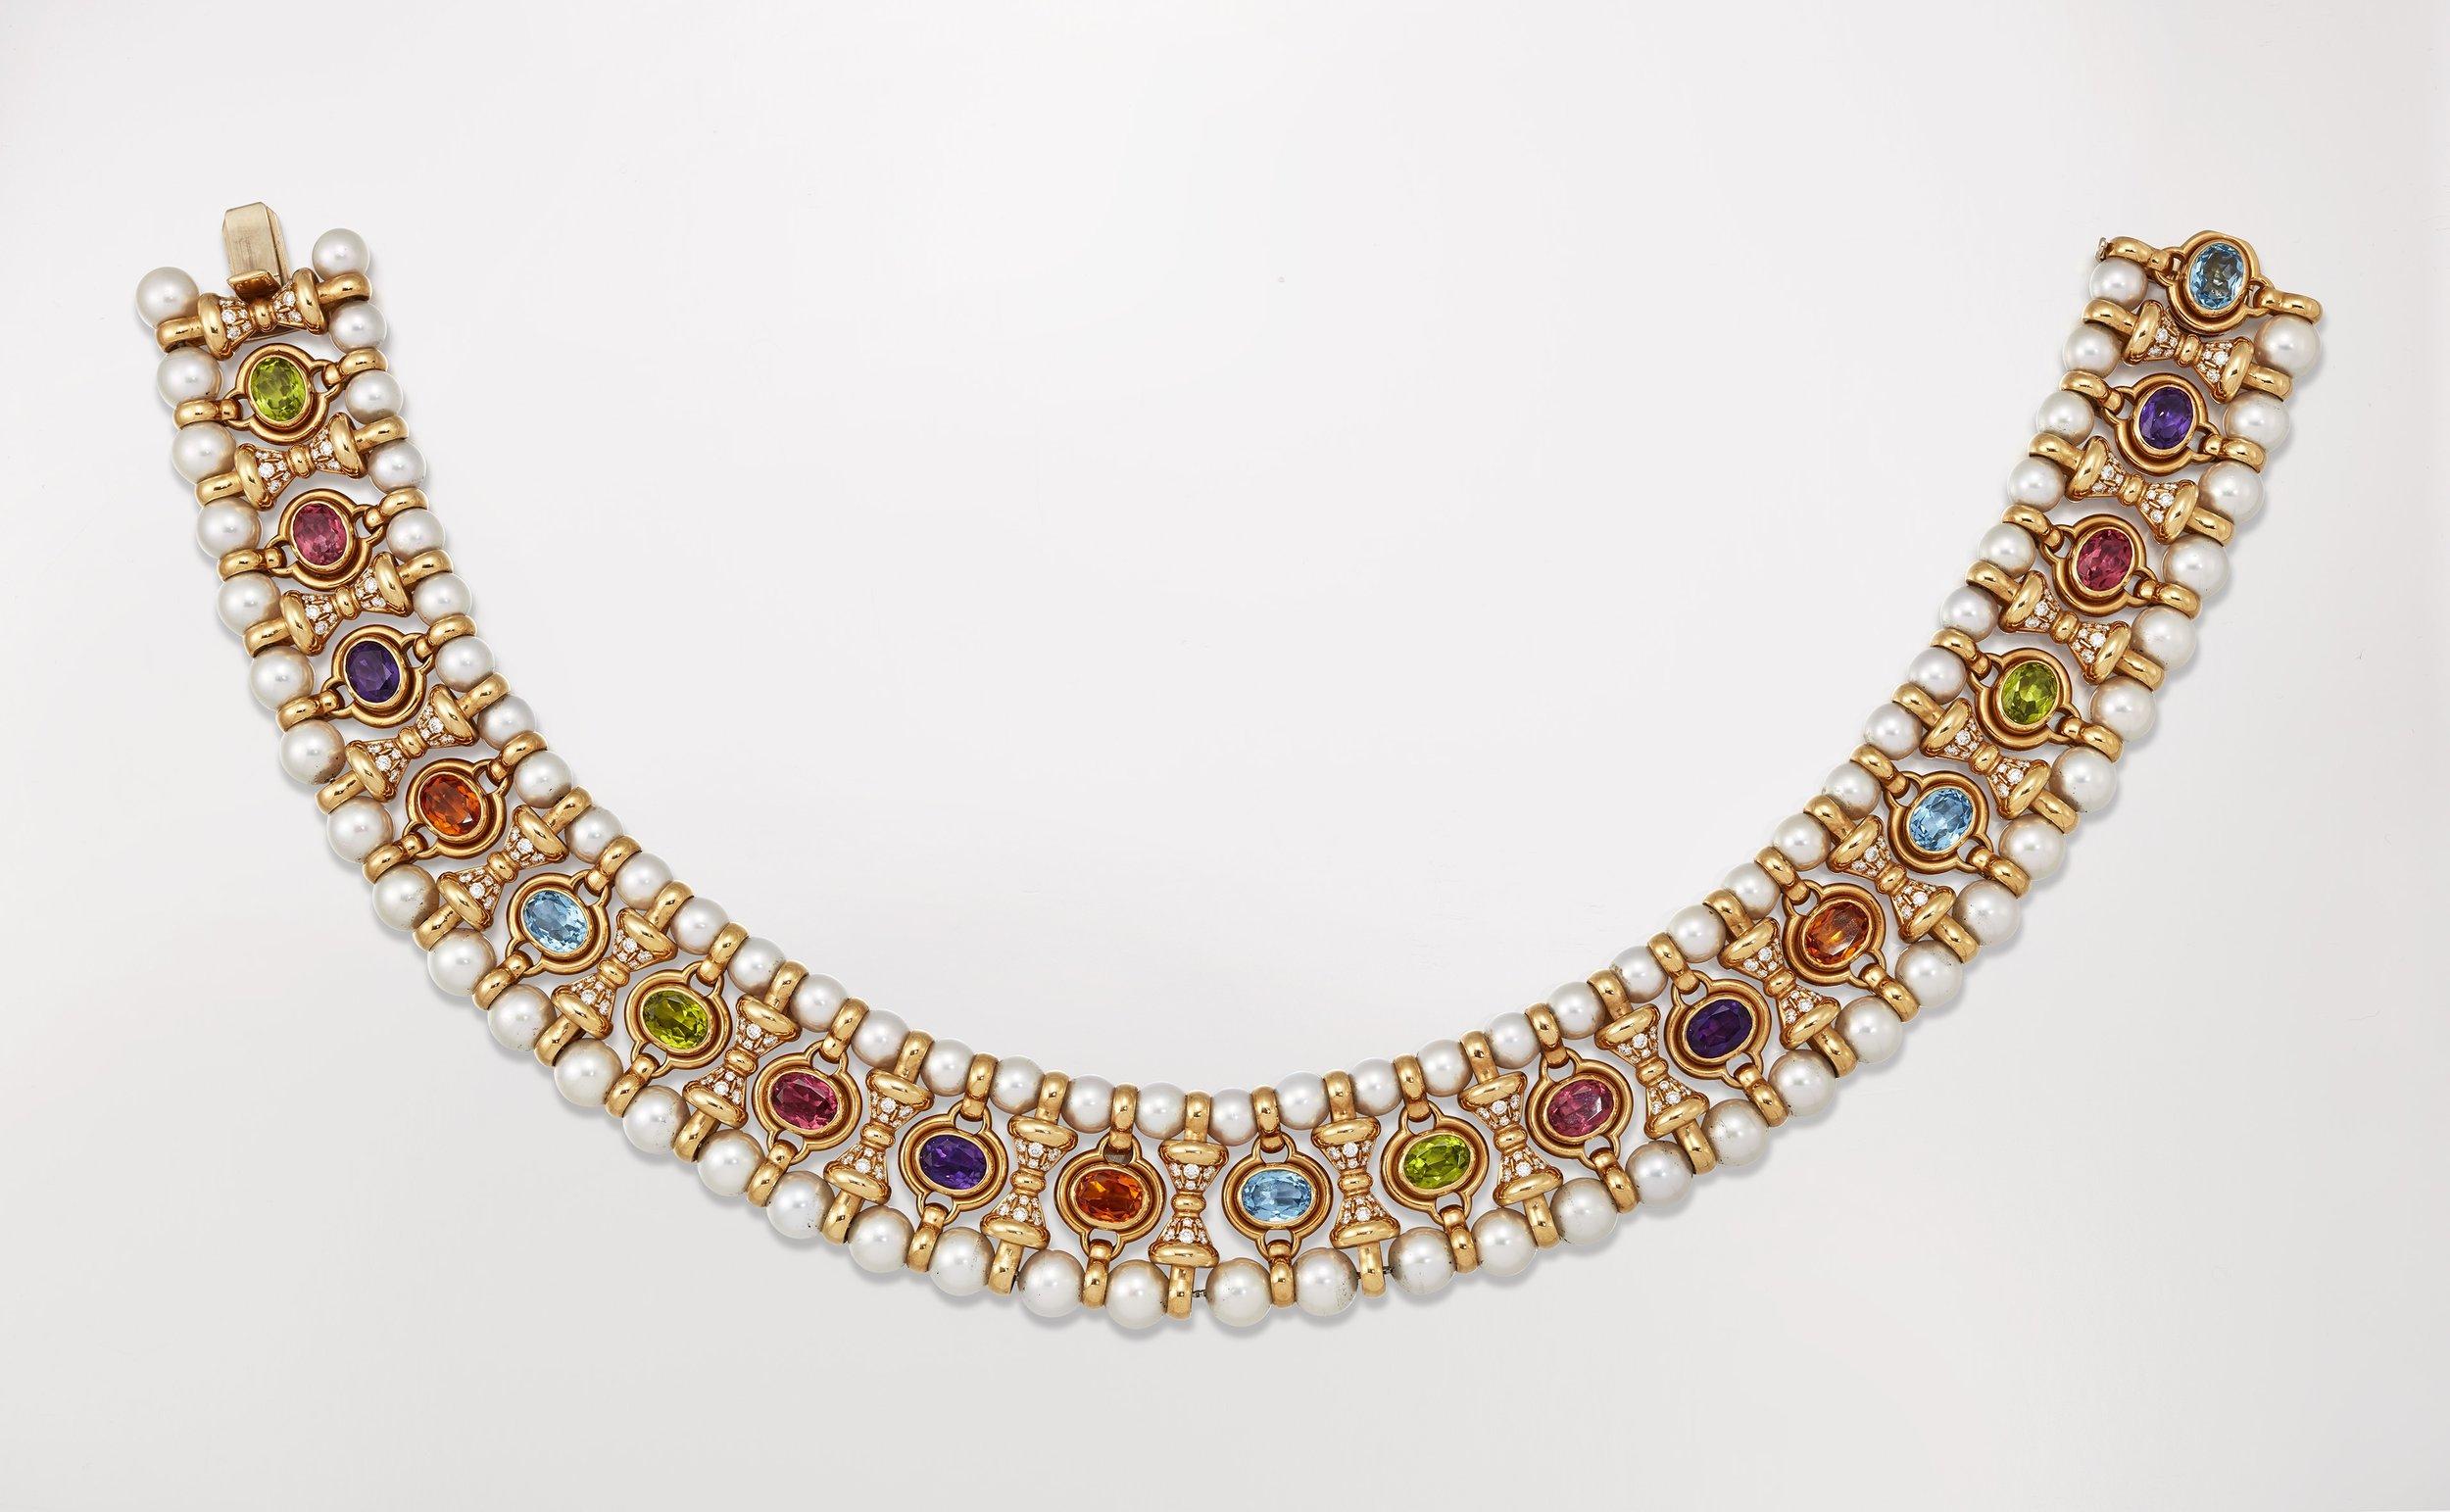 Bulgari - An 18K yellow gold, multi gem-set, cultured pearl and diamond collar necklace, circa 1990Signed BulgariNumbered